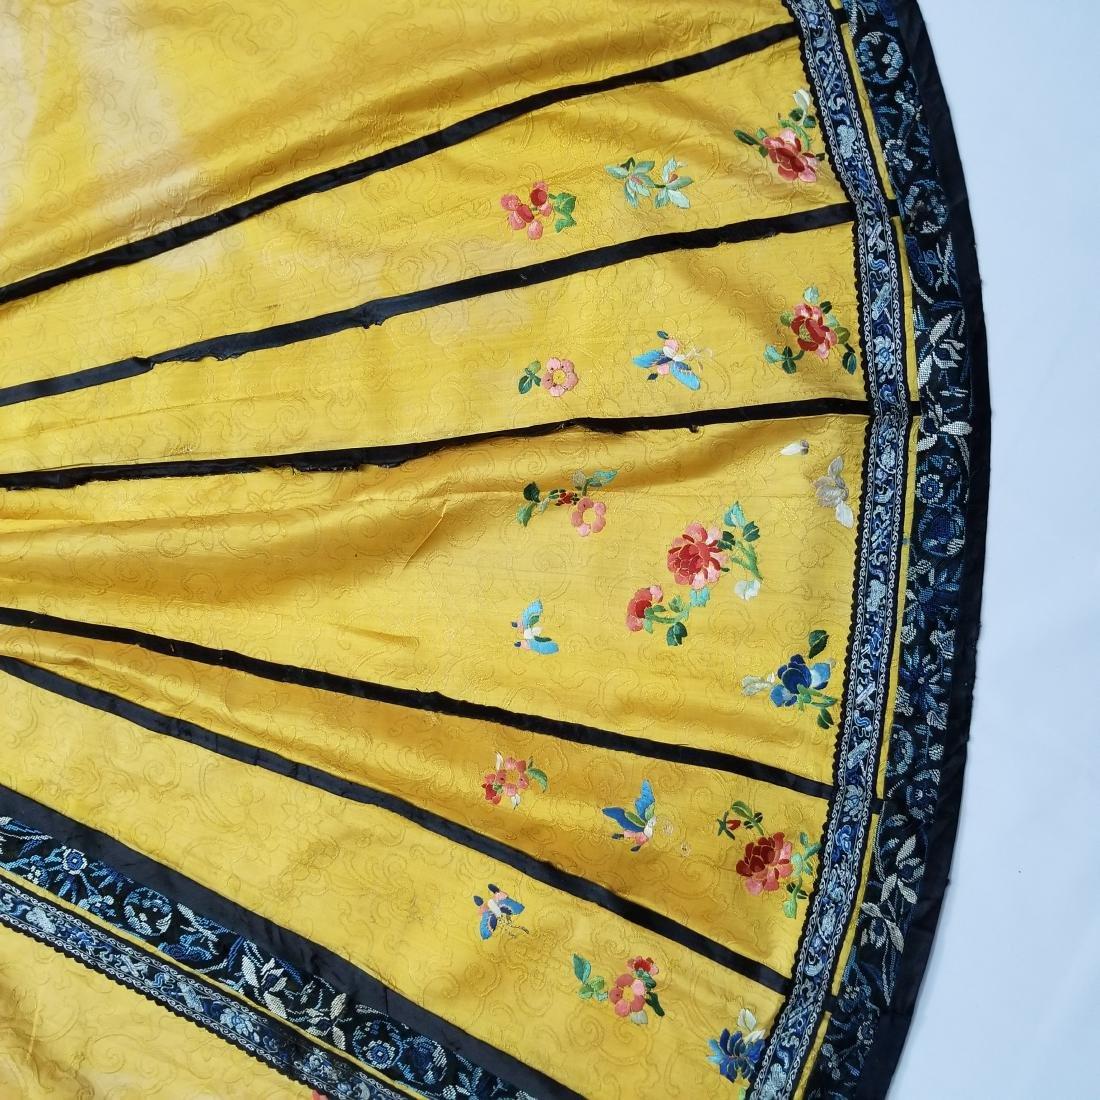 Antique Chinese Silk Hand Embroidered Skirt Forbidden - 5